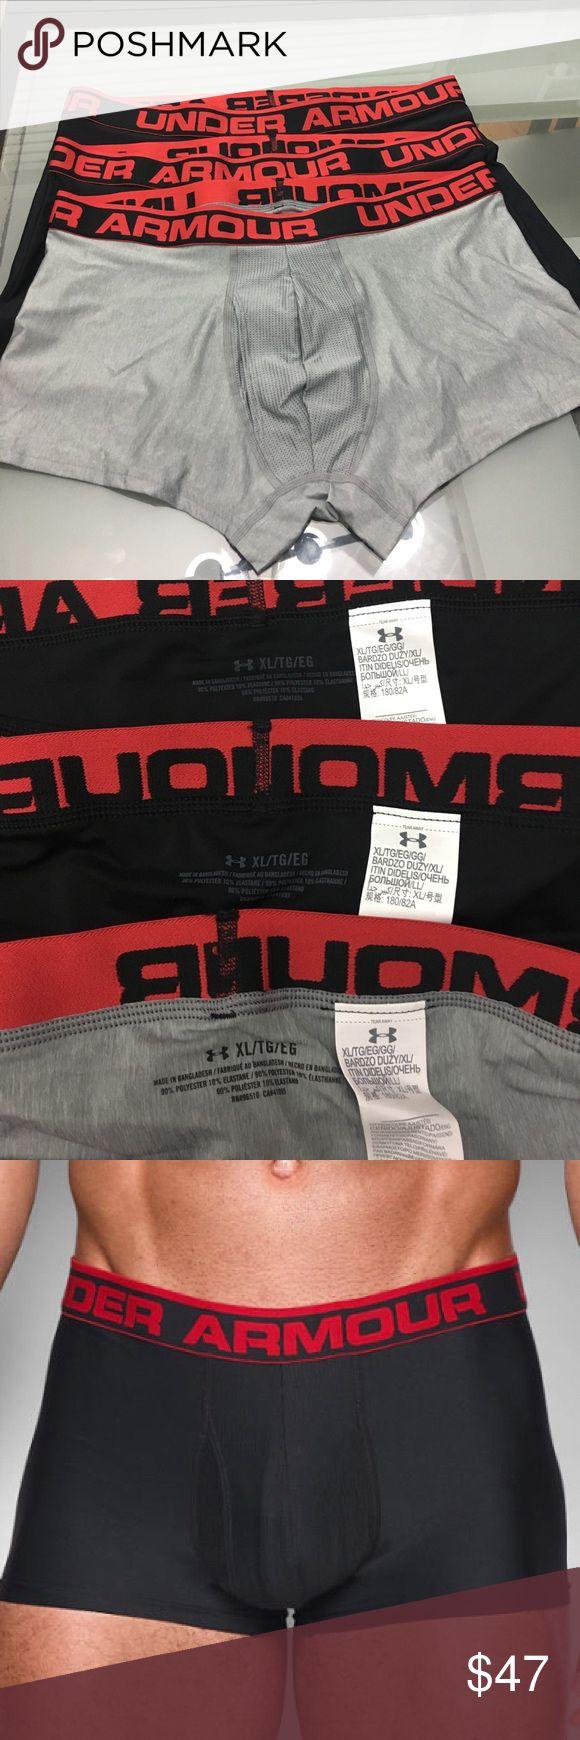 "NWOT men's Under Armor the original 3"" 6"" XL/TG NWOT men's Under Armor the original 3""6"" boxer XL/TG/EG  2-black 1-gray 1-black6"" 1-black3"",1-gray 6"" Under Armour Underwear & Socks Boxer Briefs"